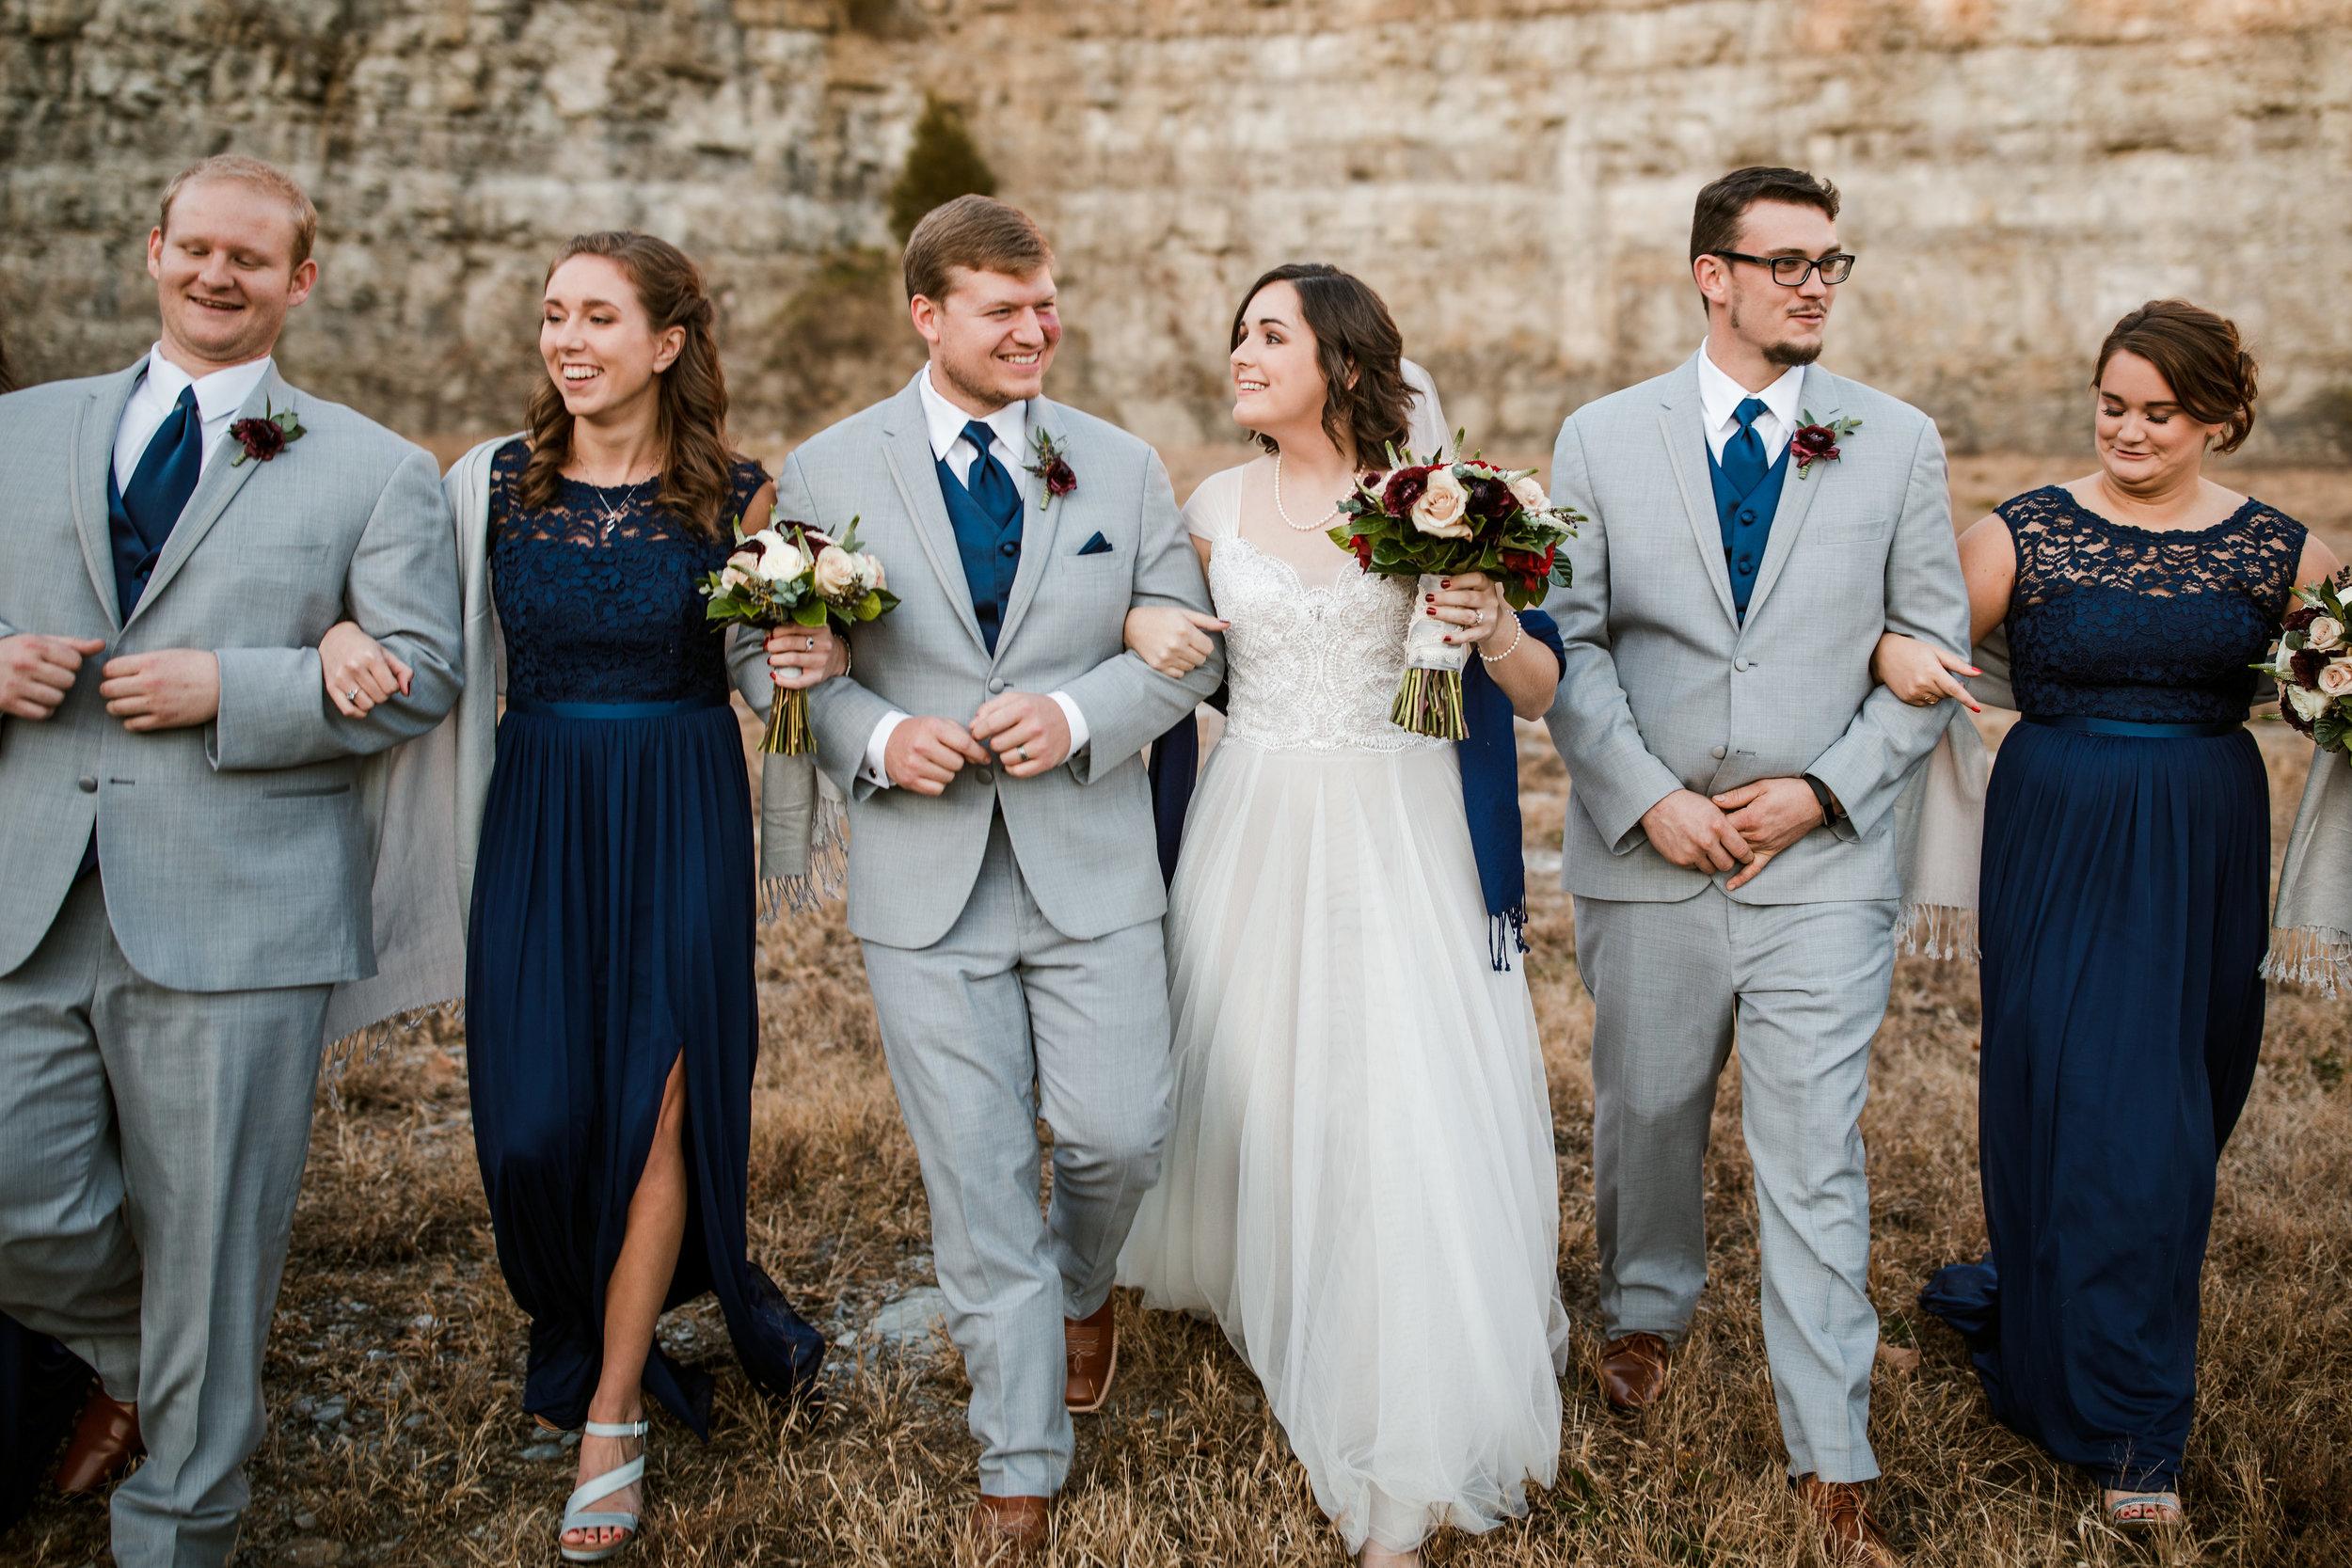 Graystone-Quarry-Wedding 57.jpg